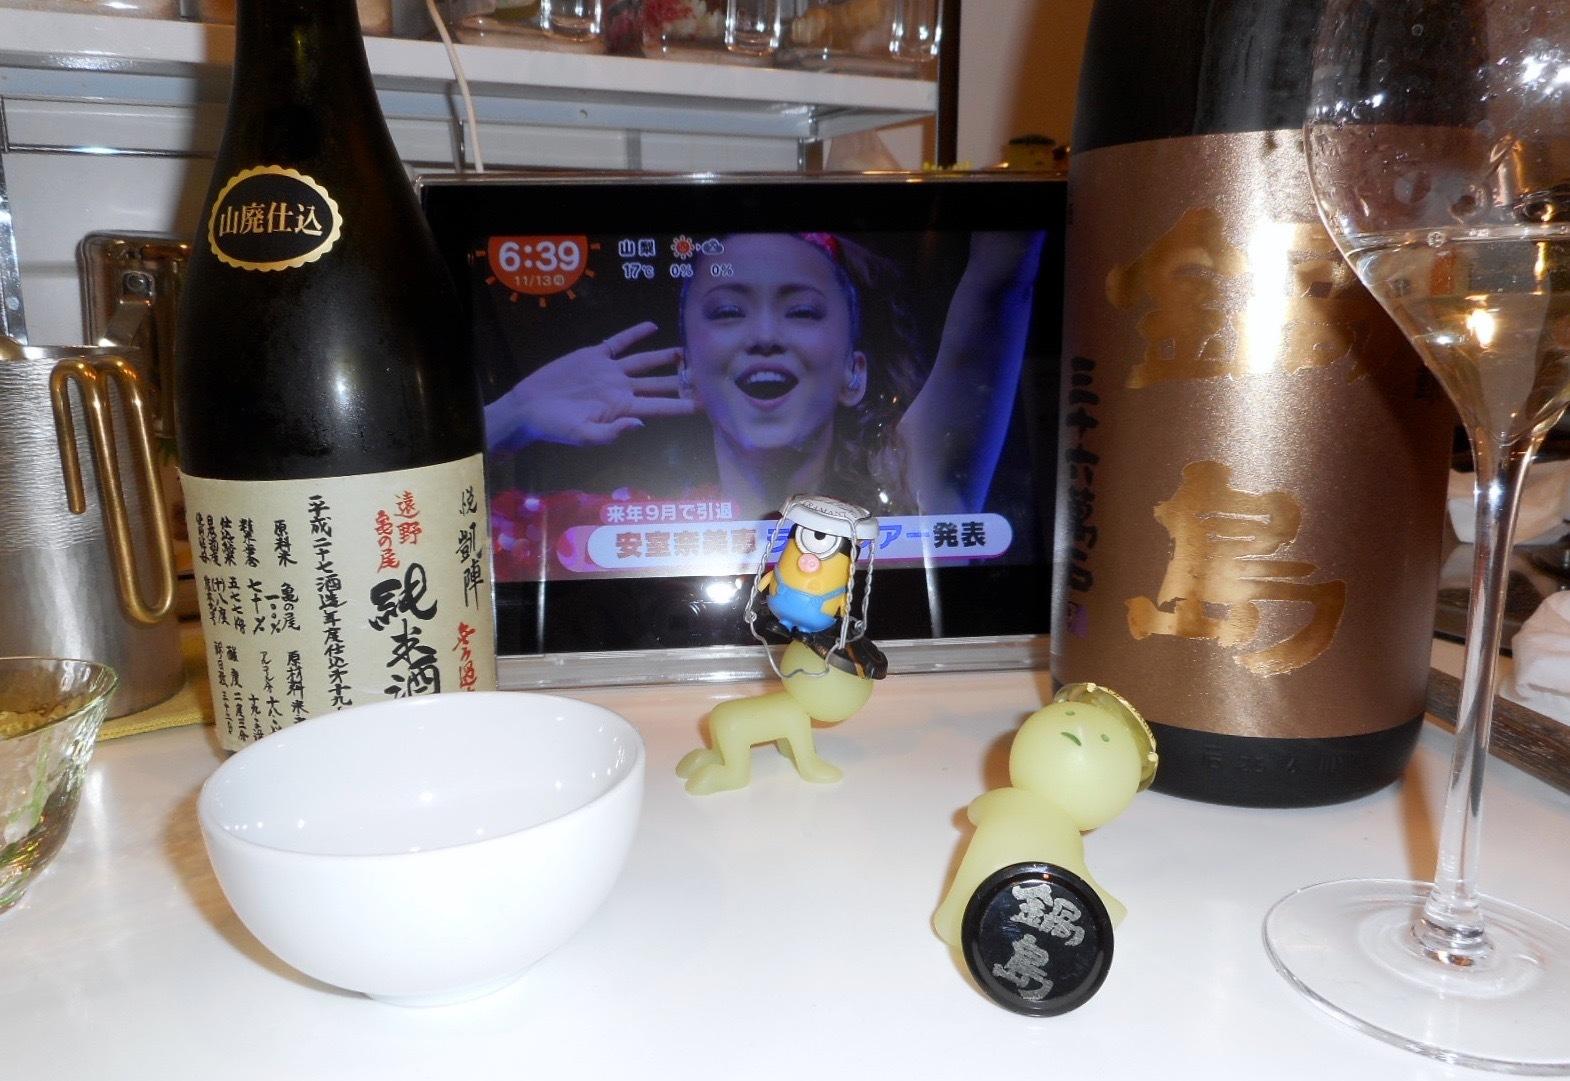 nabeshima_jundai_yoshikawa28by10.jpg